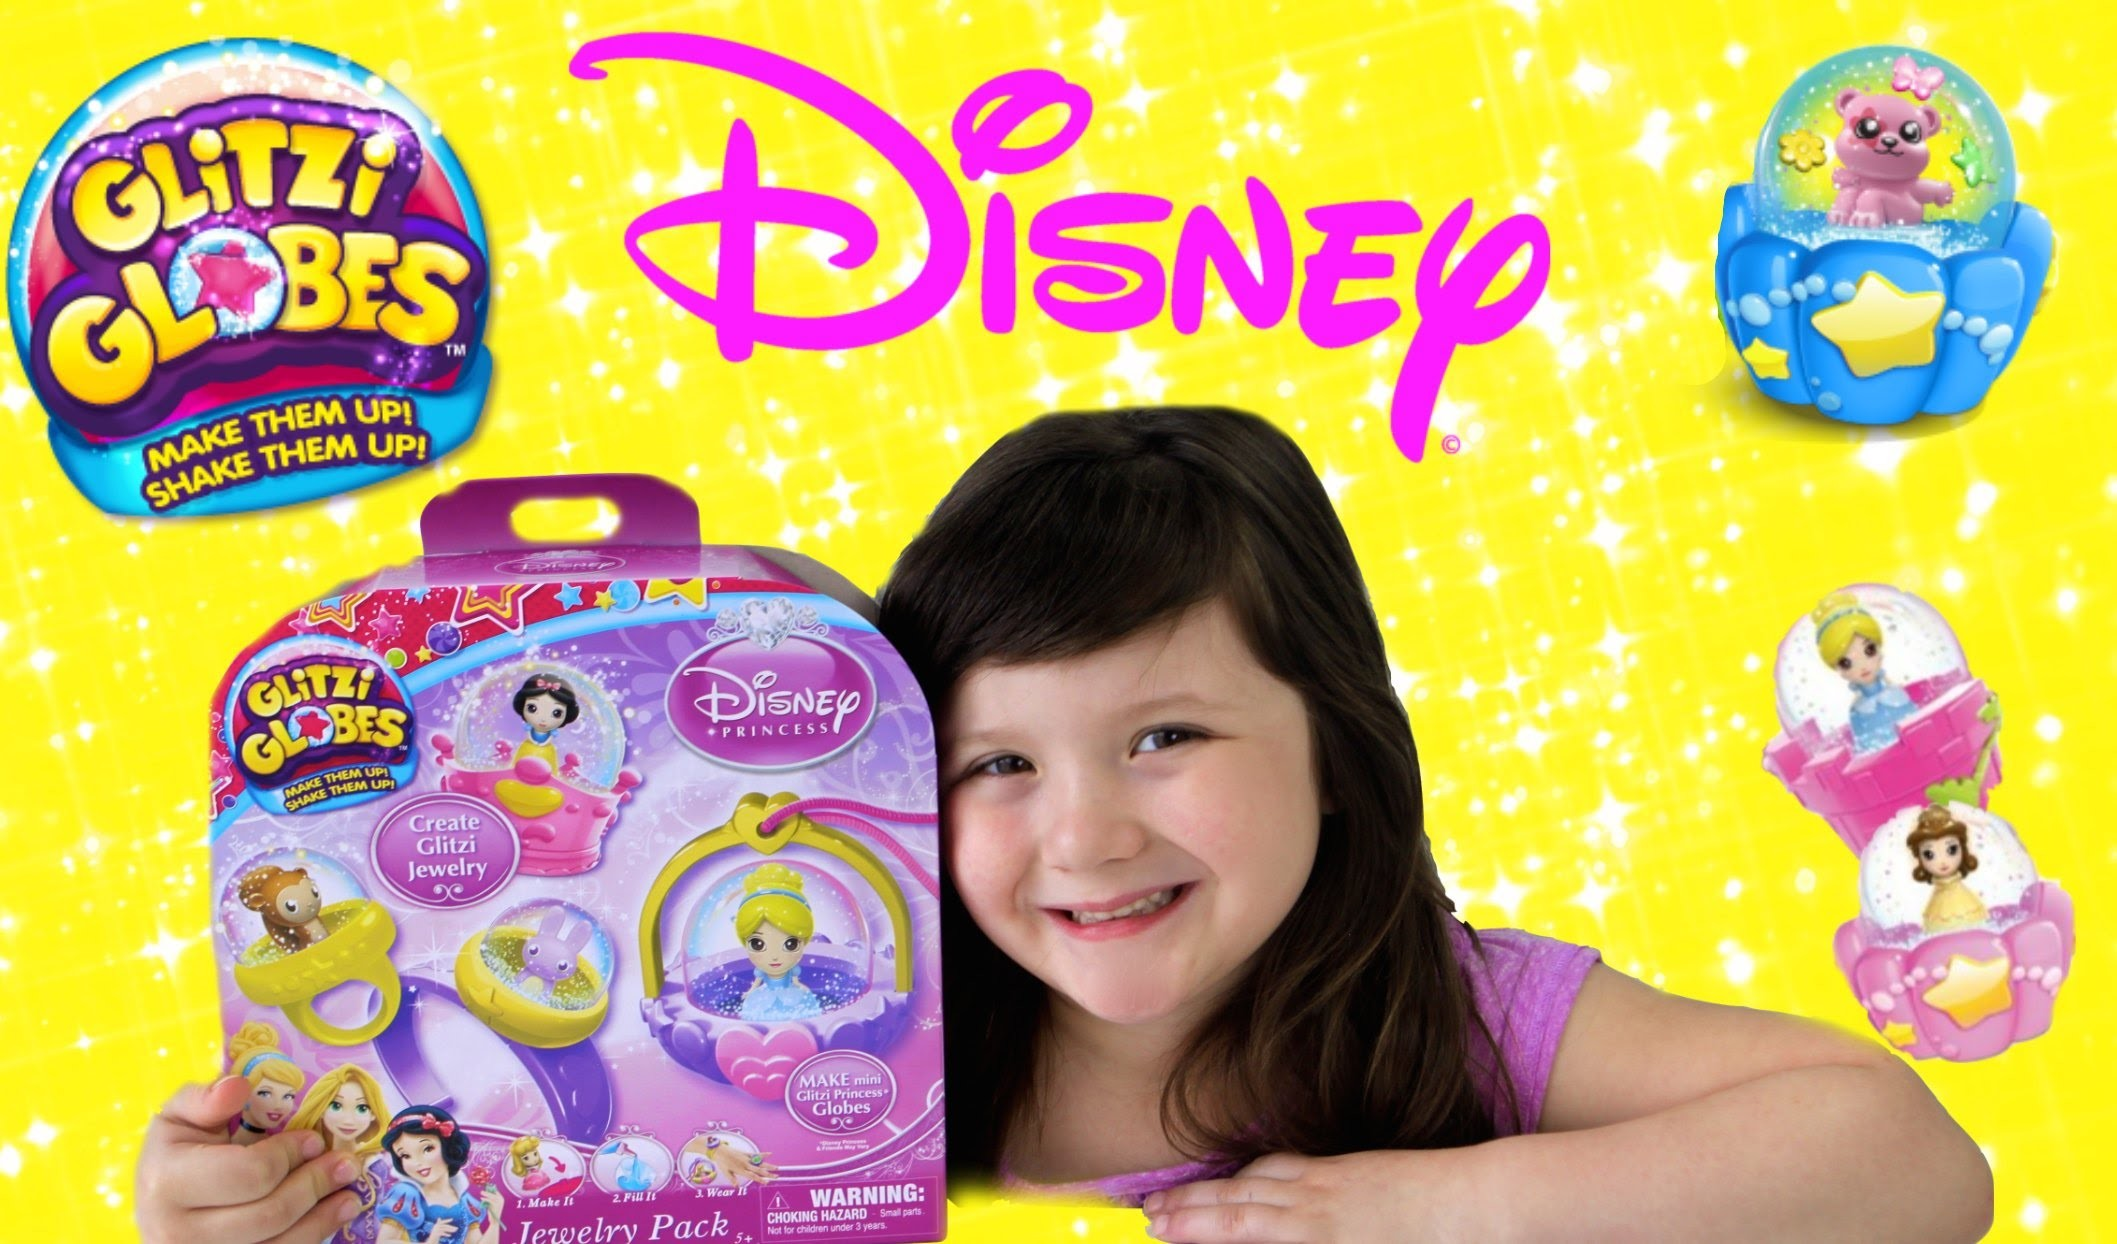 Disney Princess Glitzi Globes Jewelry Maker-DIY Glitzi Globes Princess Jewelry by MOOSE toys!